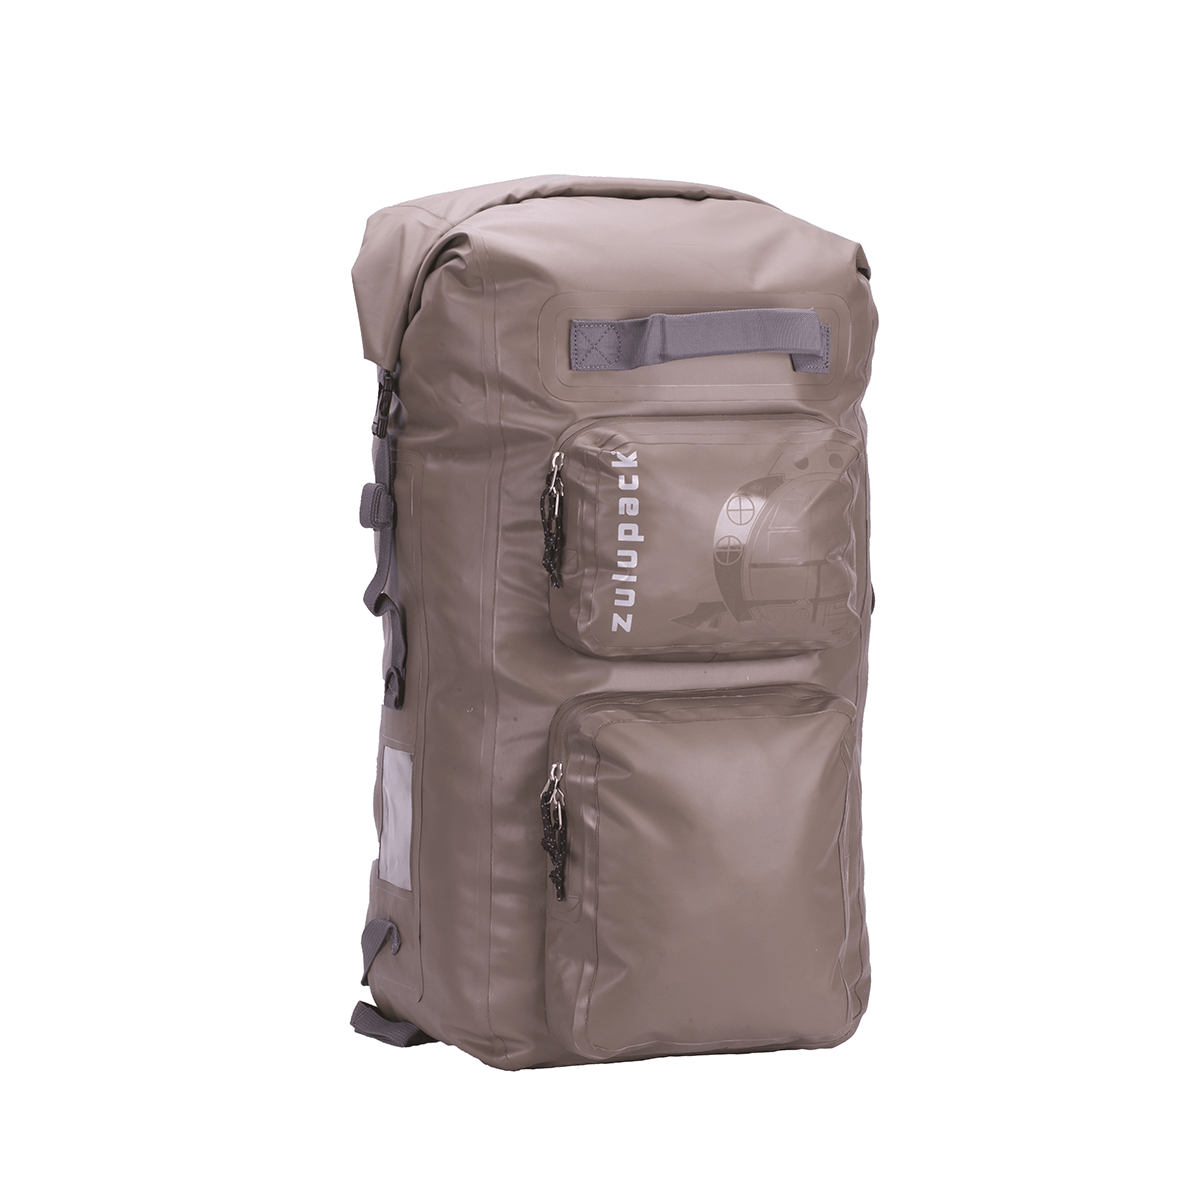 ZULUPACK – WA-16939-7 – NOMAD 65 – 1 -warm grey (détouré)